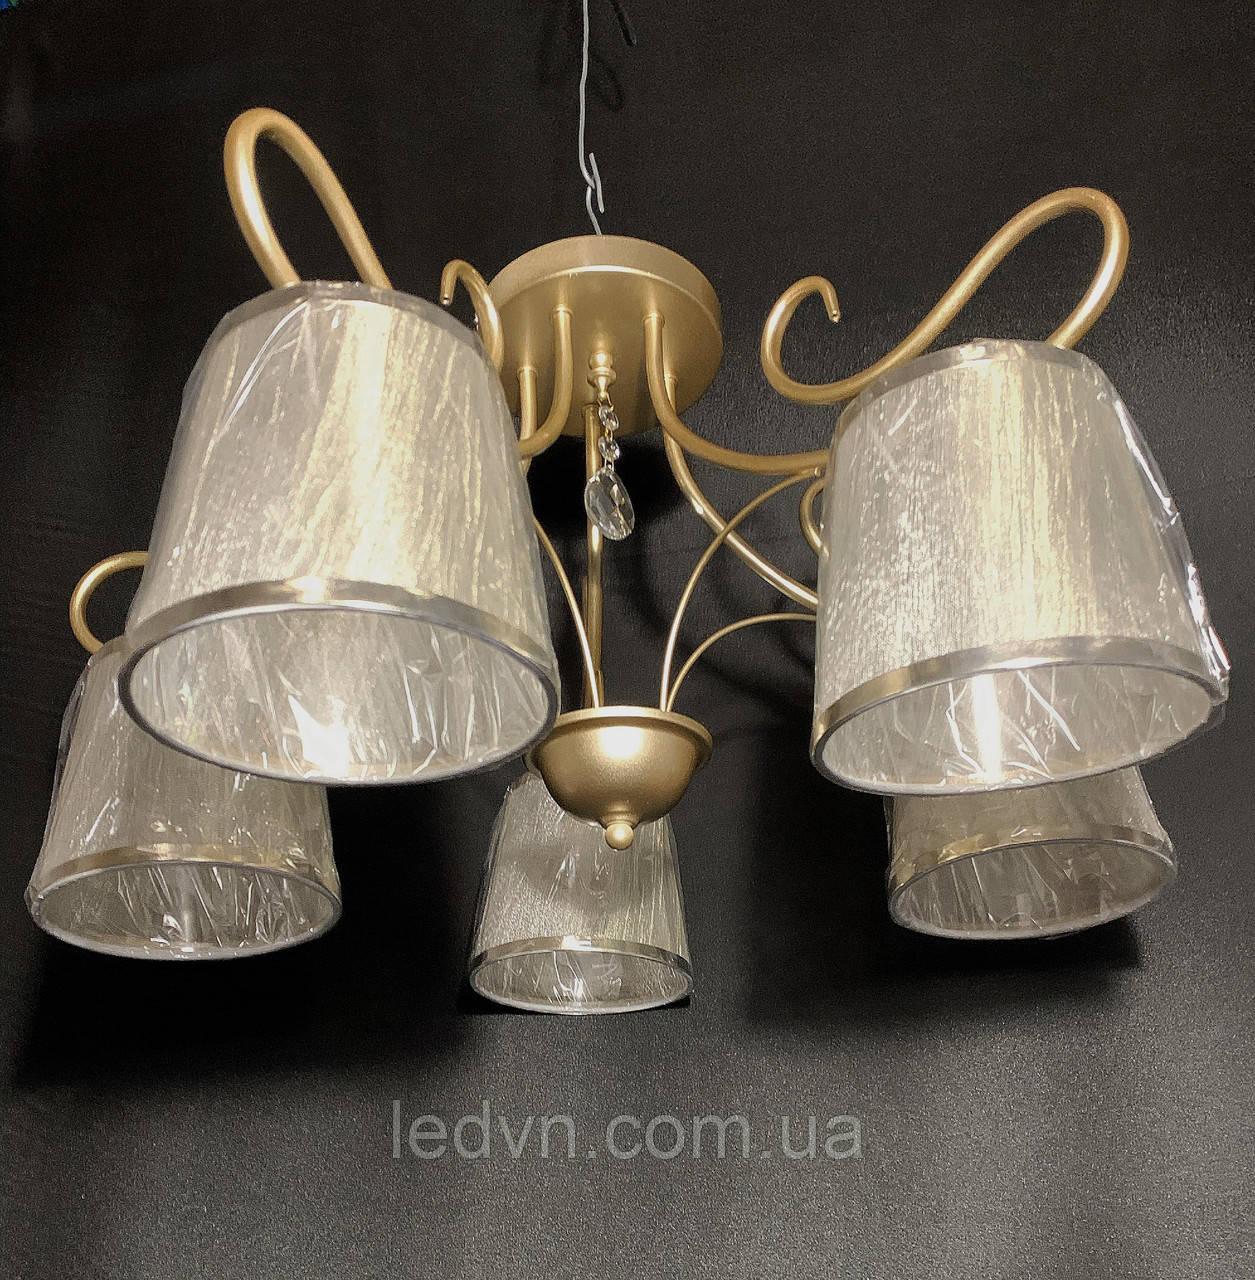 Класична стельова люстра з абажурами на 5 ламп